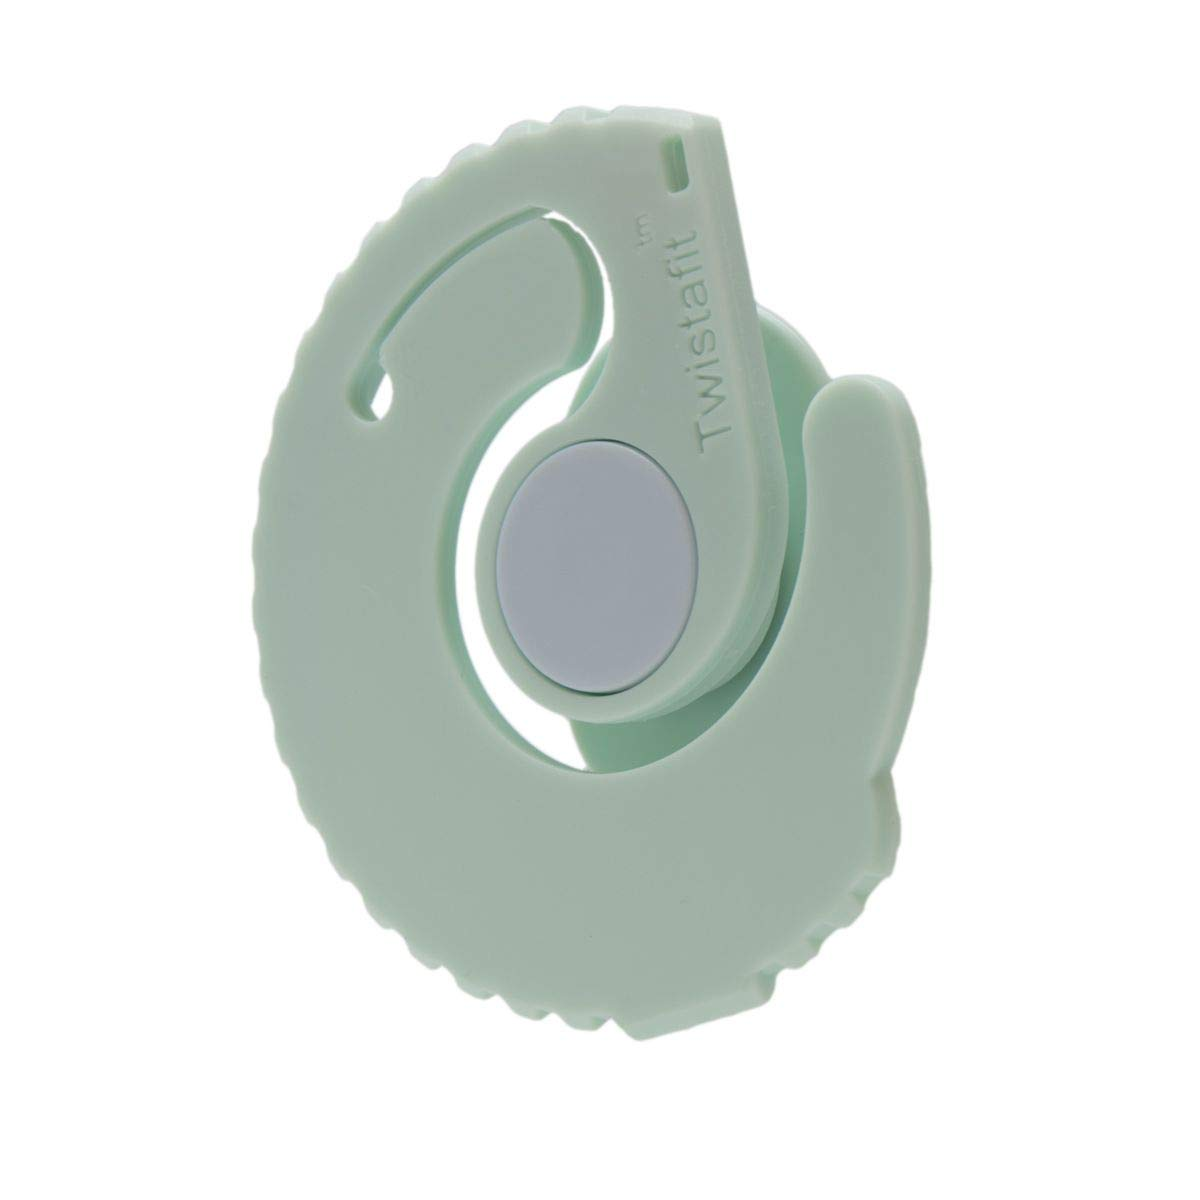 A Fitting Phone Grip Flexy Grips Spot On Green /& Blue